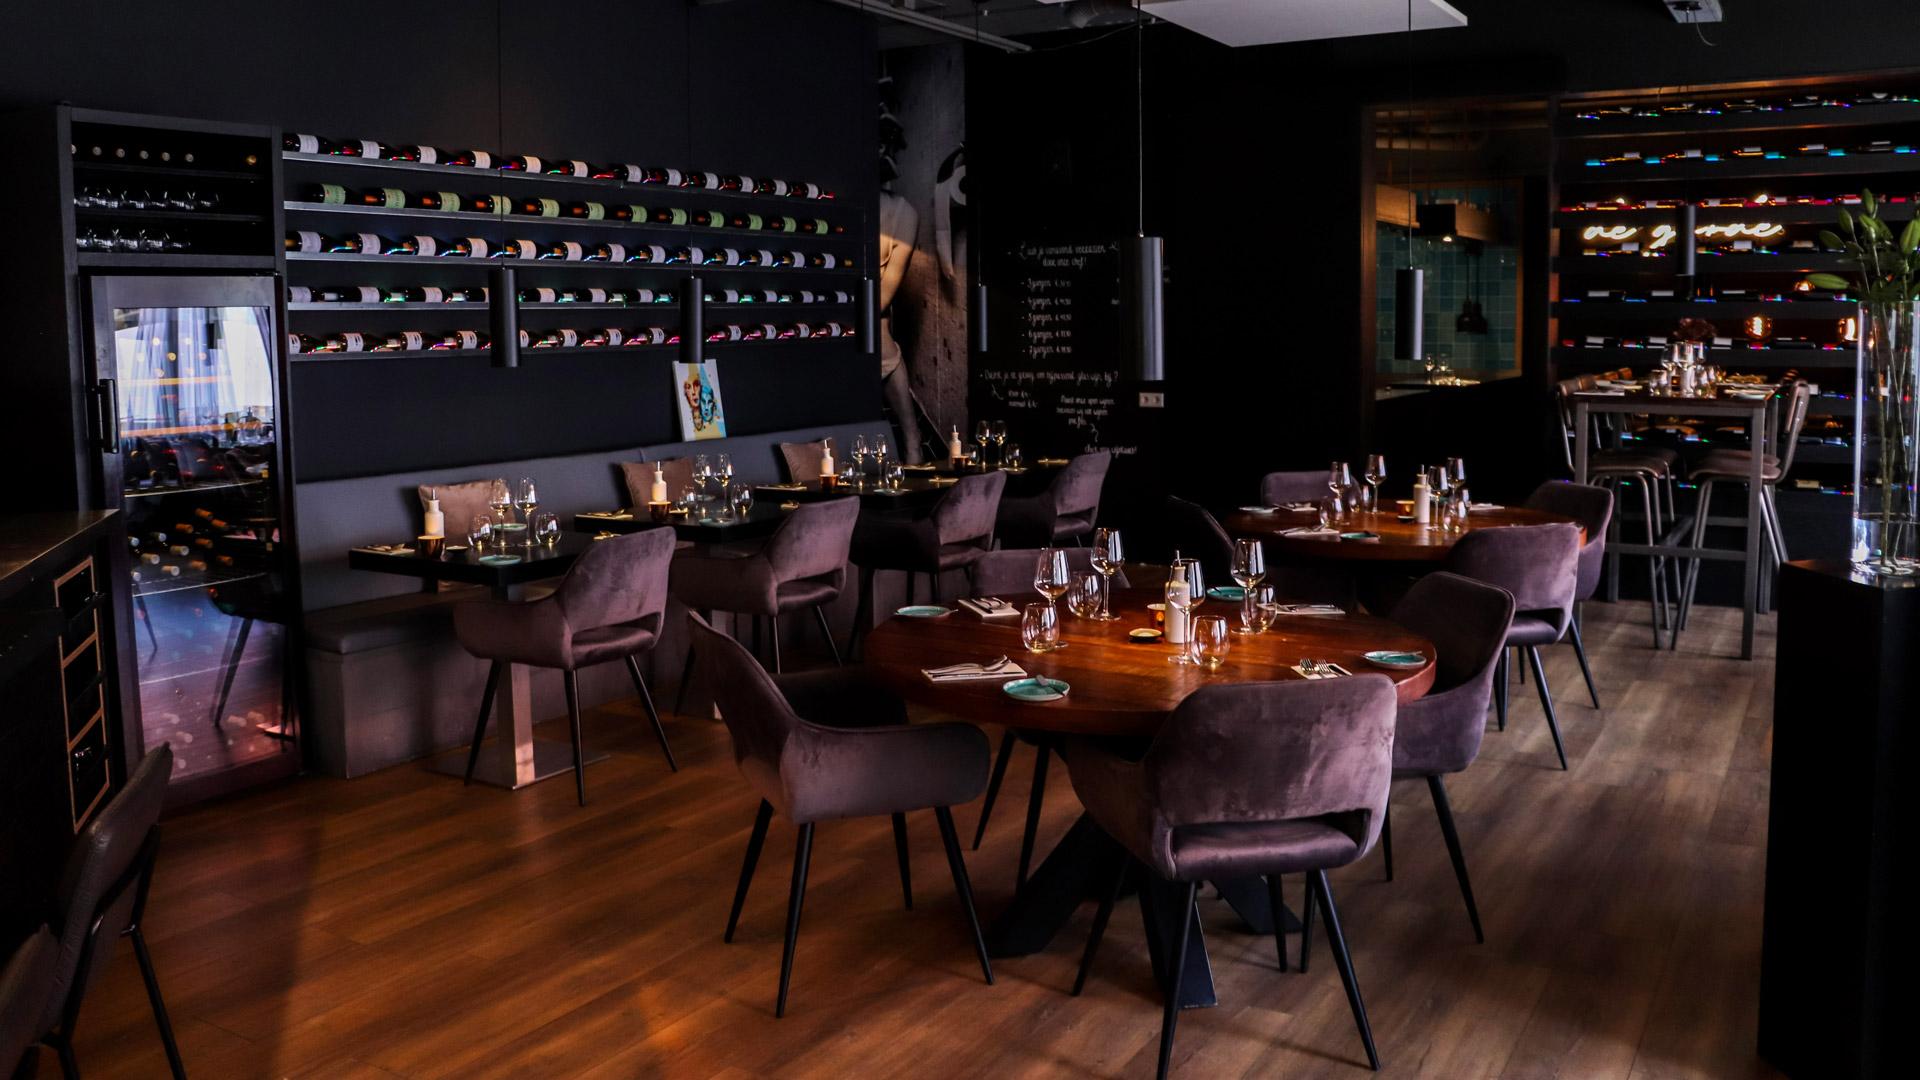 Restaurant Caert Harderwijk